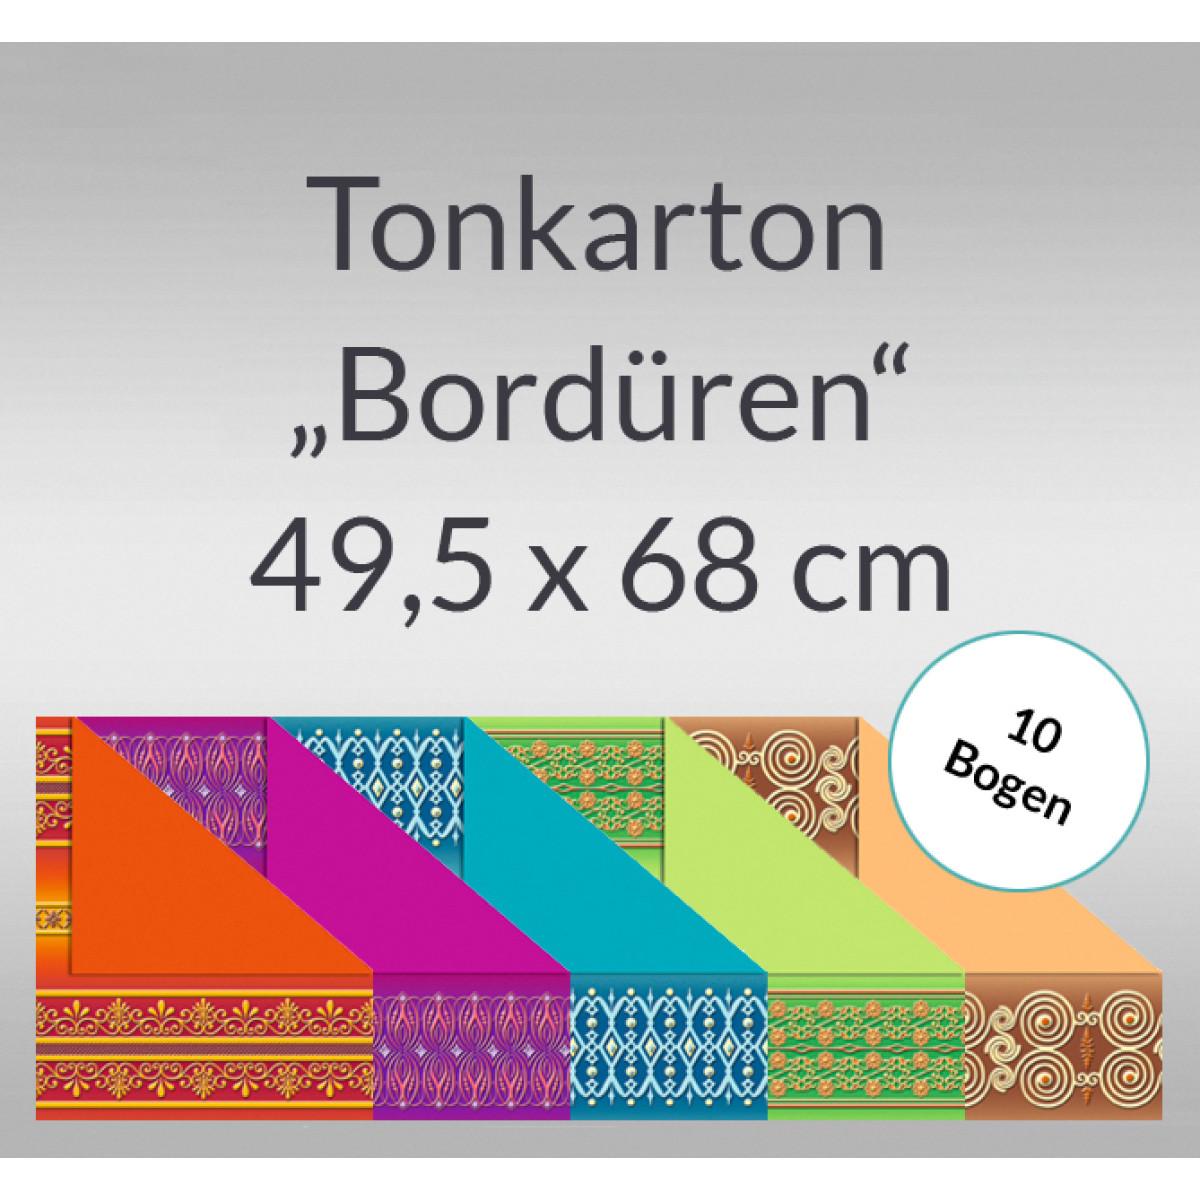 "Tonkarton ""Bordüren"" 220 g/qm 49,5 x 68 cm - 10 Bogen"